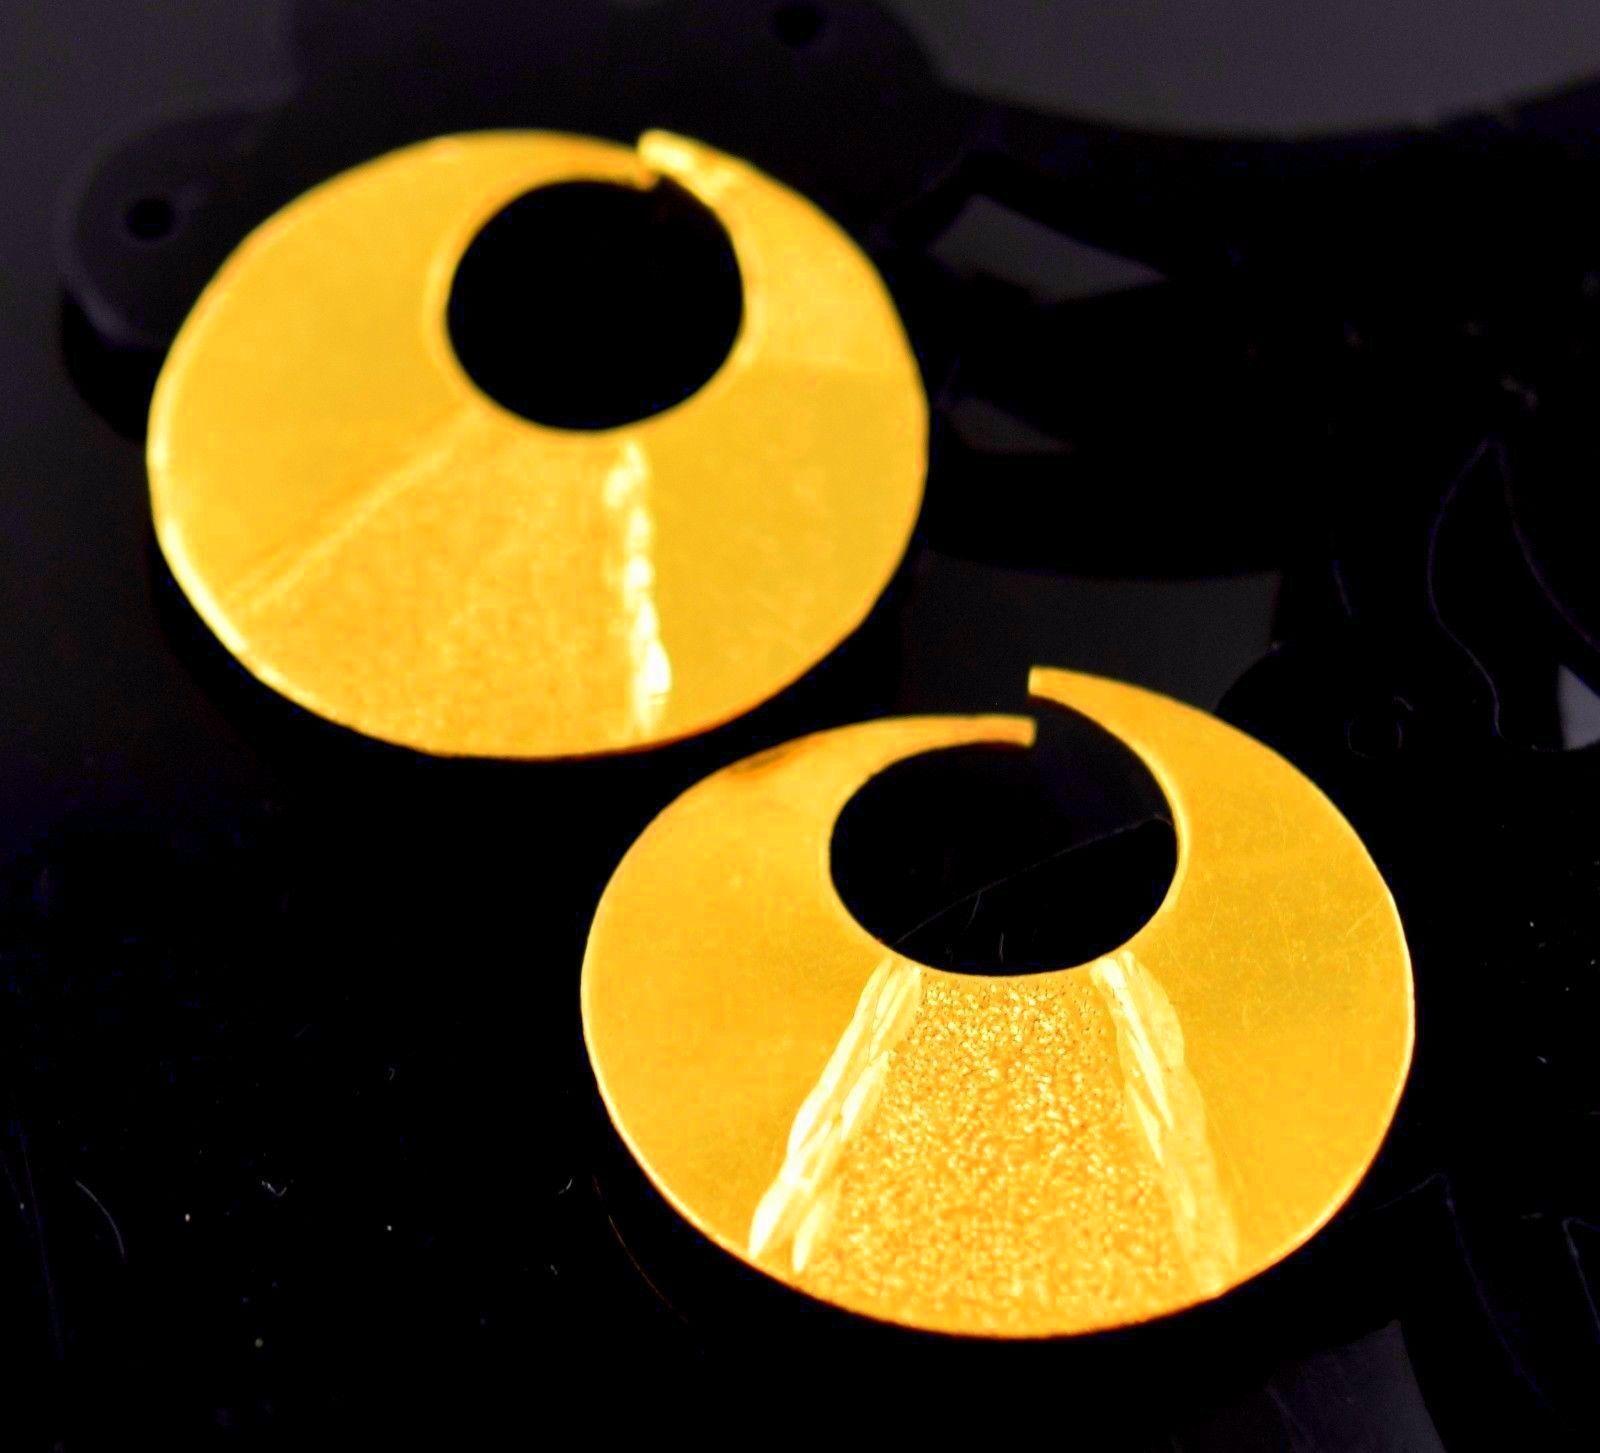 HANDMADE 22 CARAT  YELLOW gold MURKI MURKIYA EARRING HOOP PAIR DESIGH